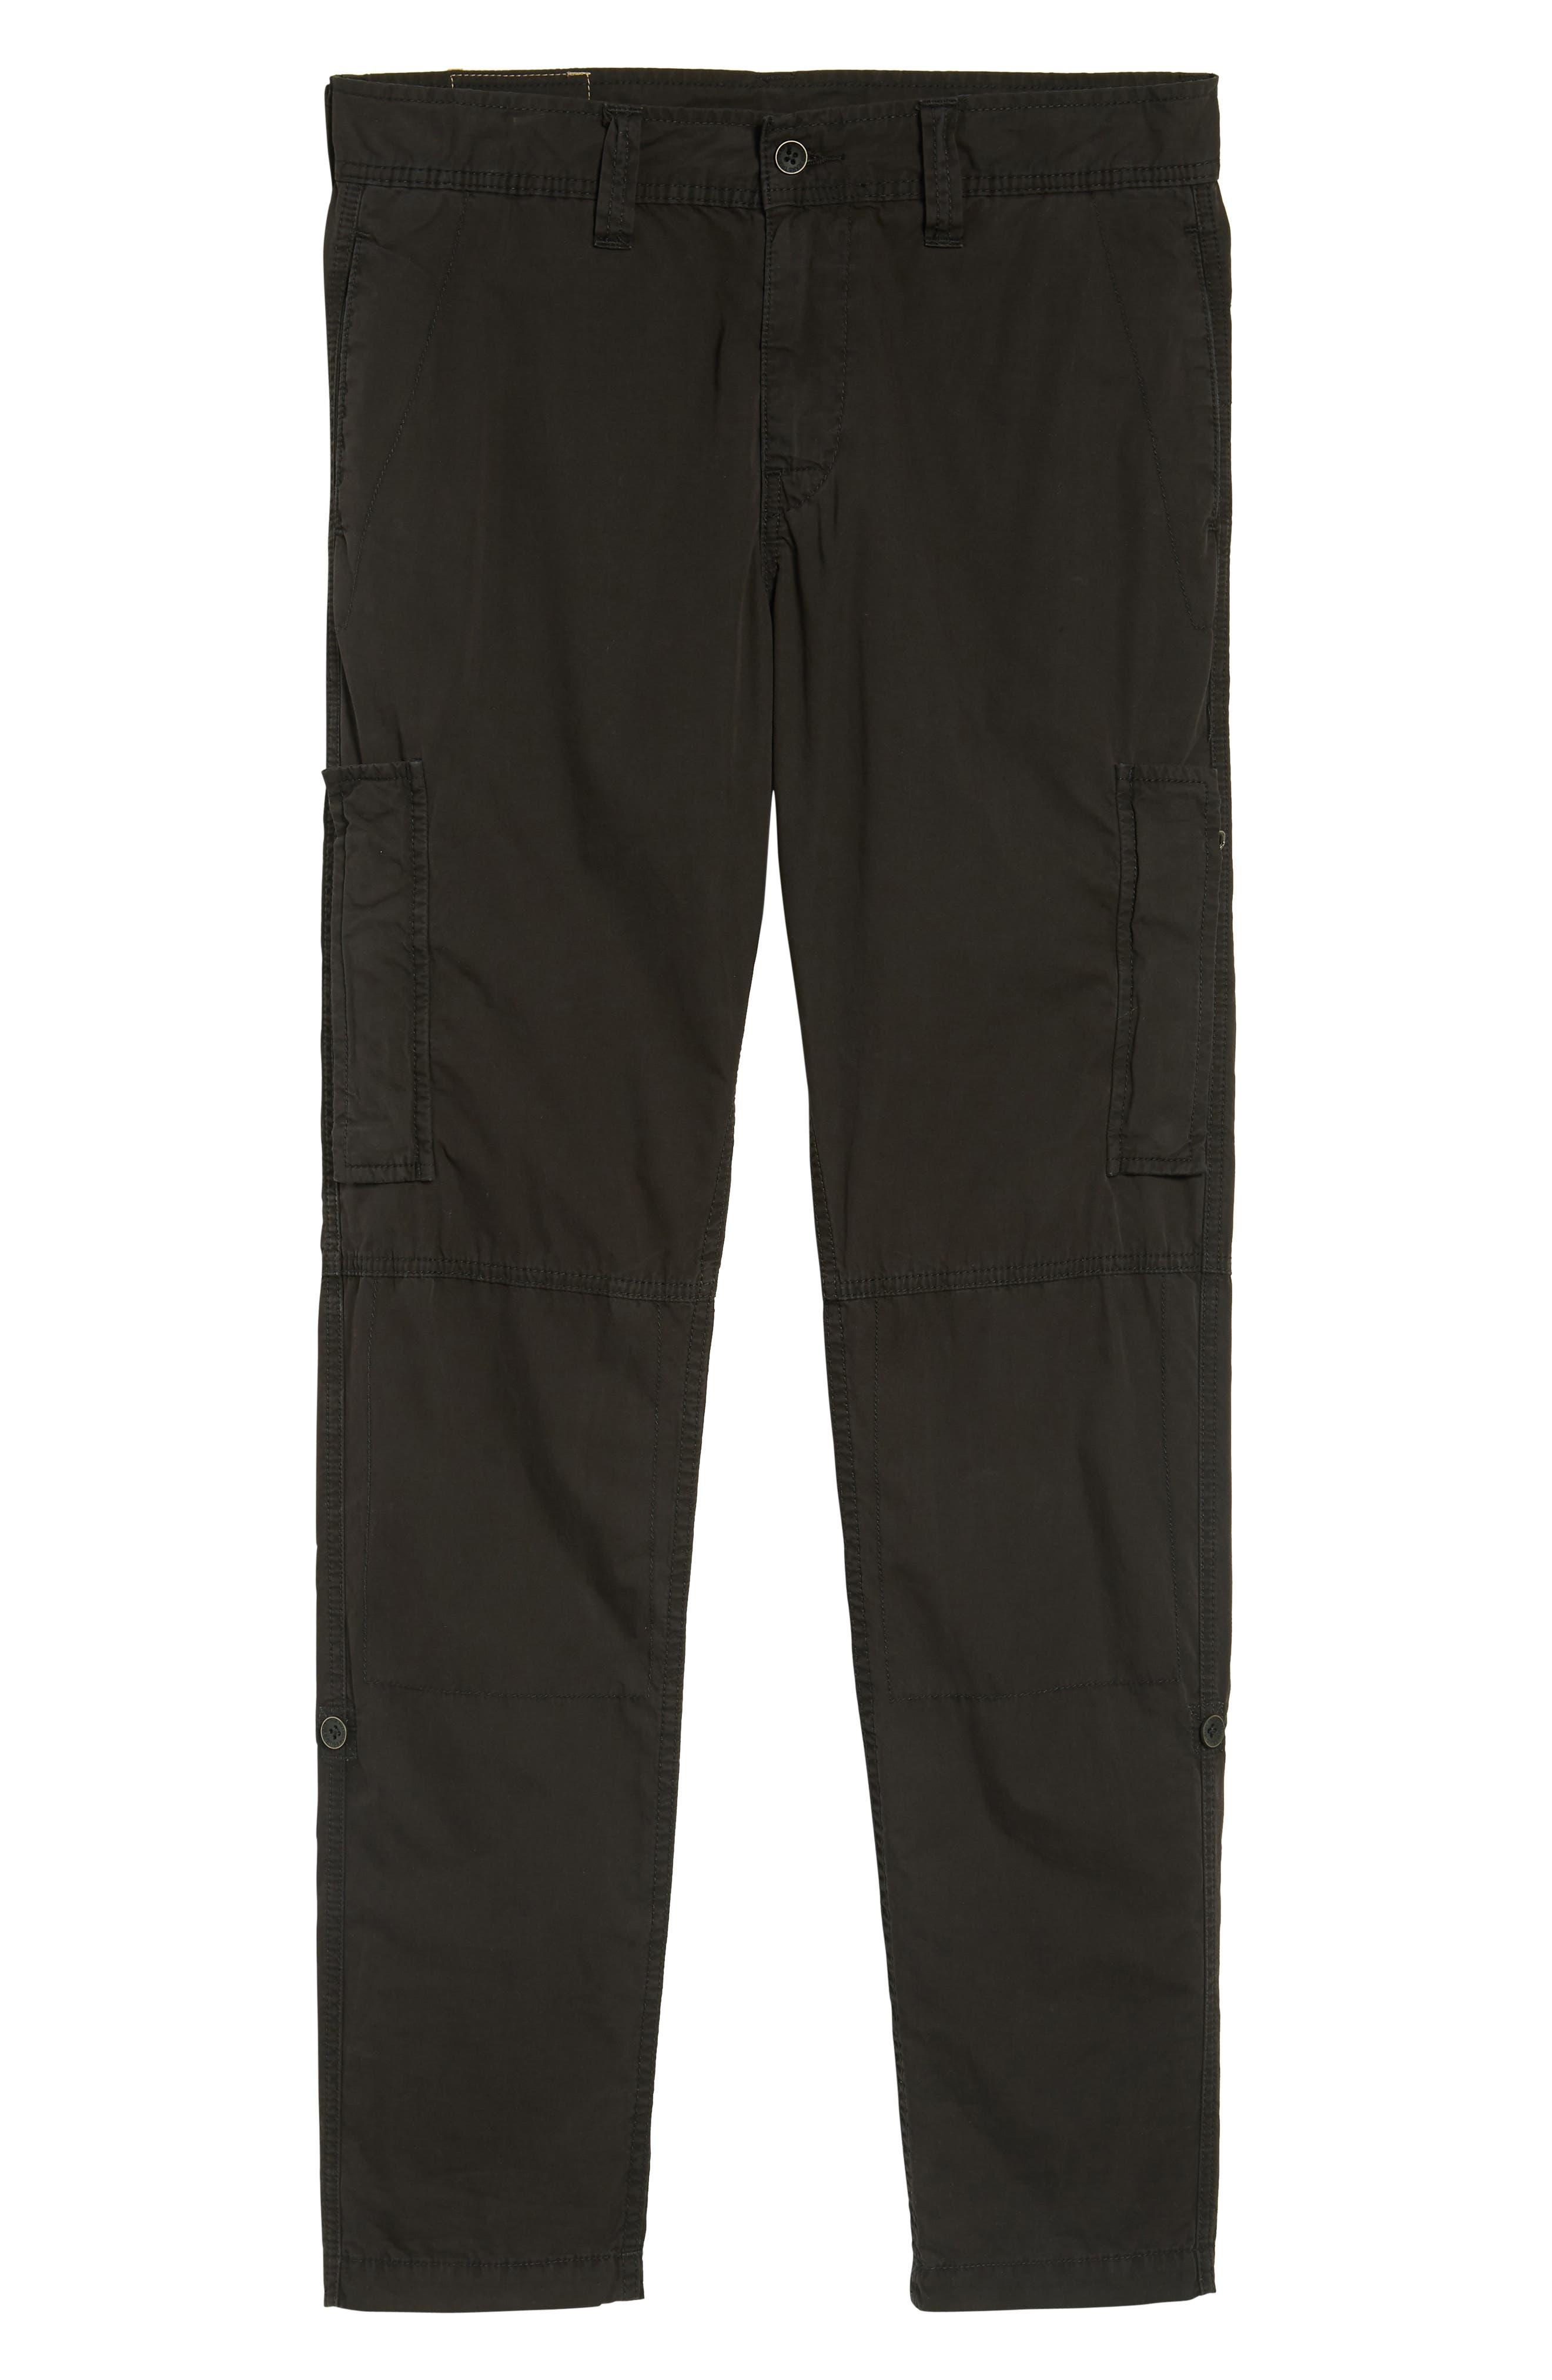 Officer Field Pants,                             Alternate thumbnail 6, color,                             Black